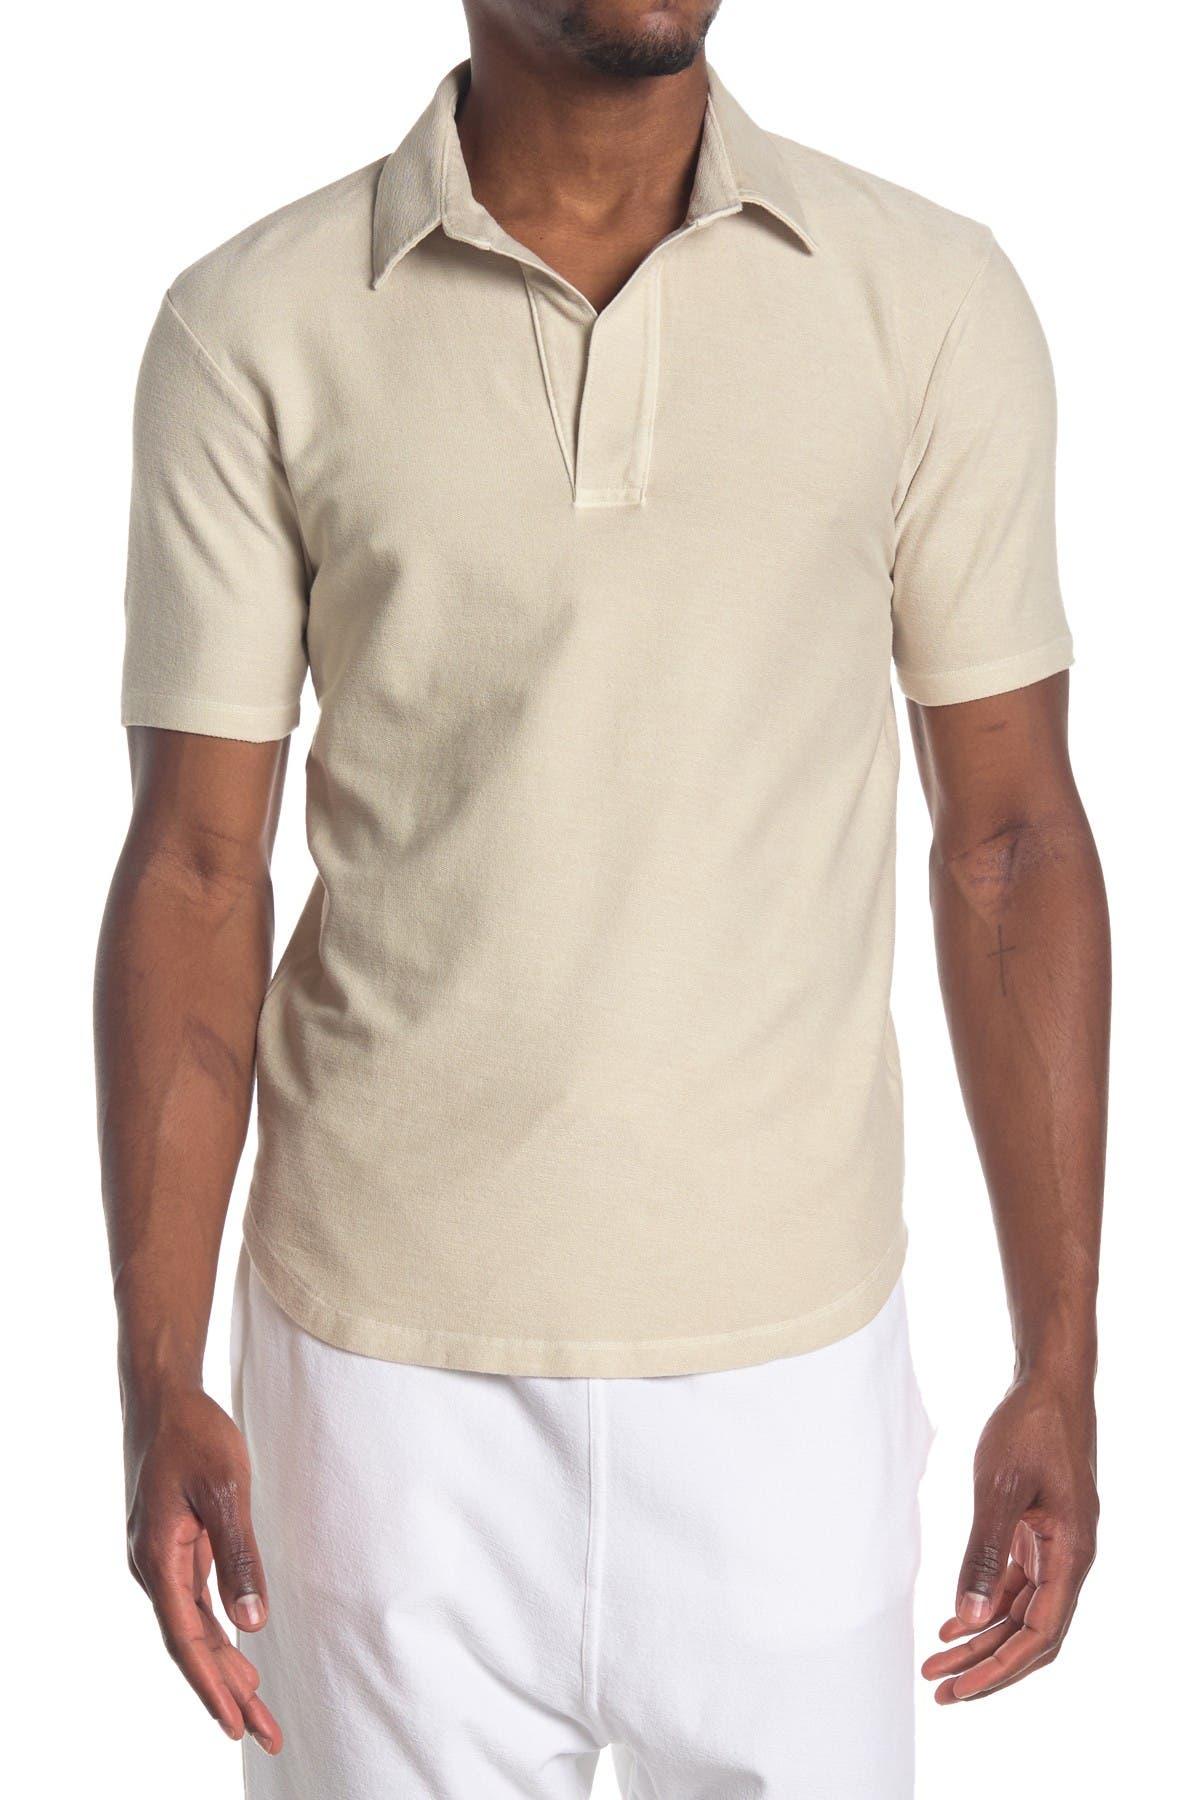 1930s Mens Shirts | Dress Shirts, Polo Shirts, Work Shirts Goodlife Sun Faded Reverso Curve Hem Polo - Oyster at Nordstrom Rack $59.97 AT vintagedancer.com